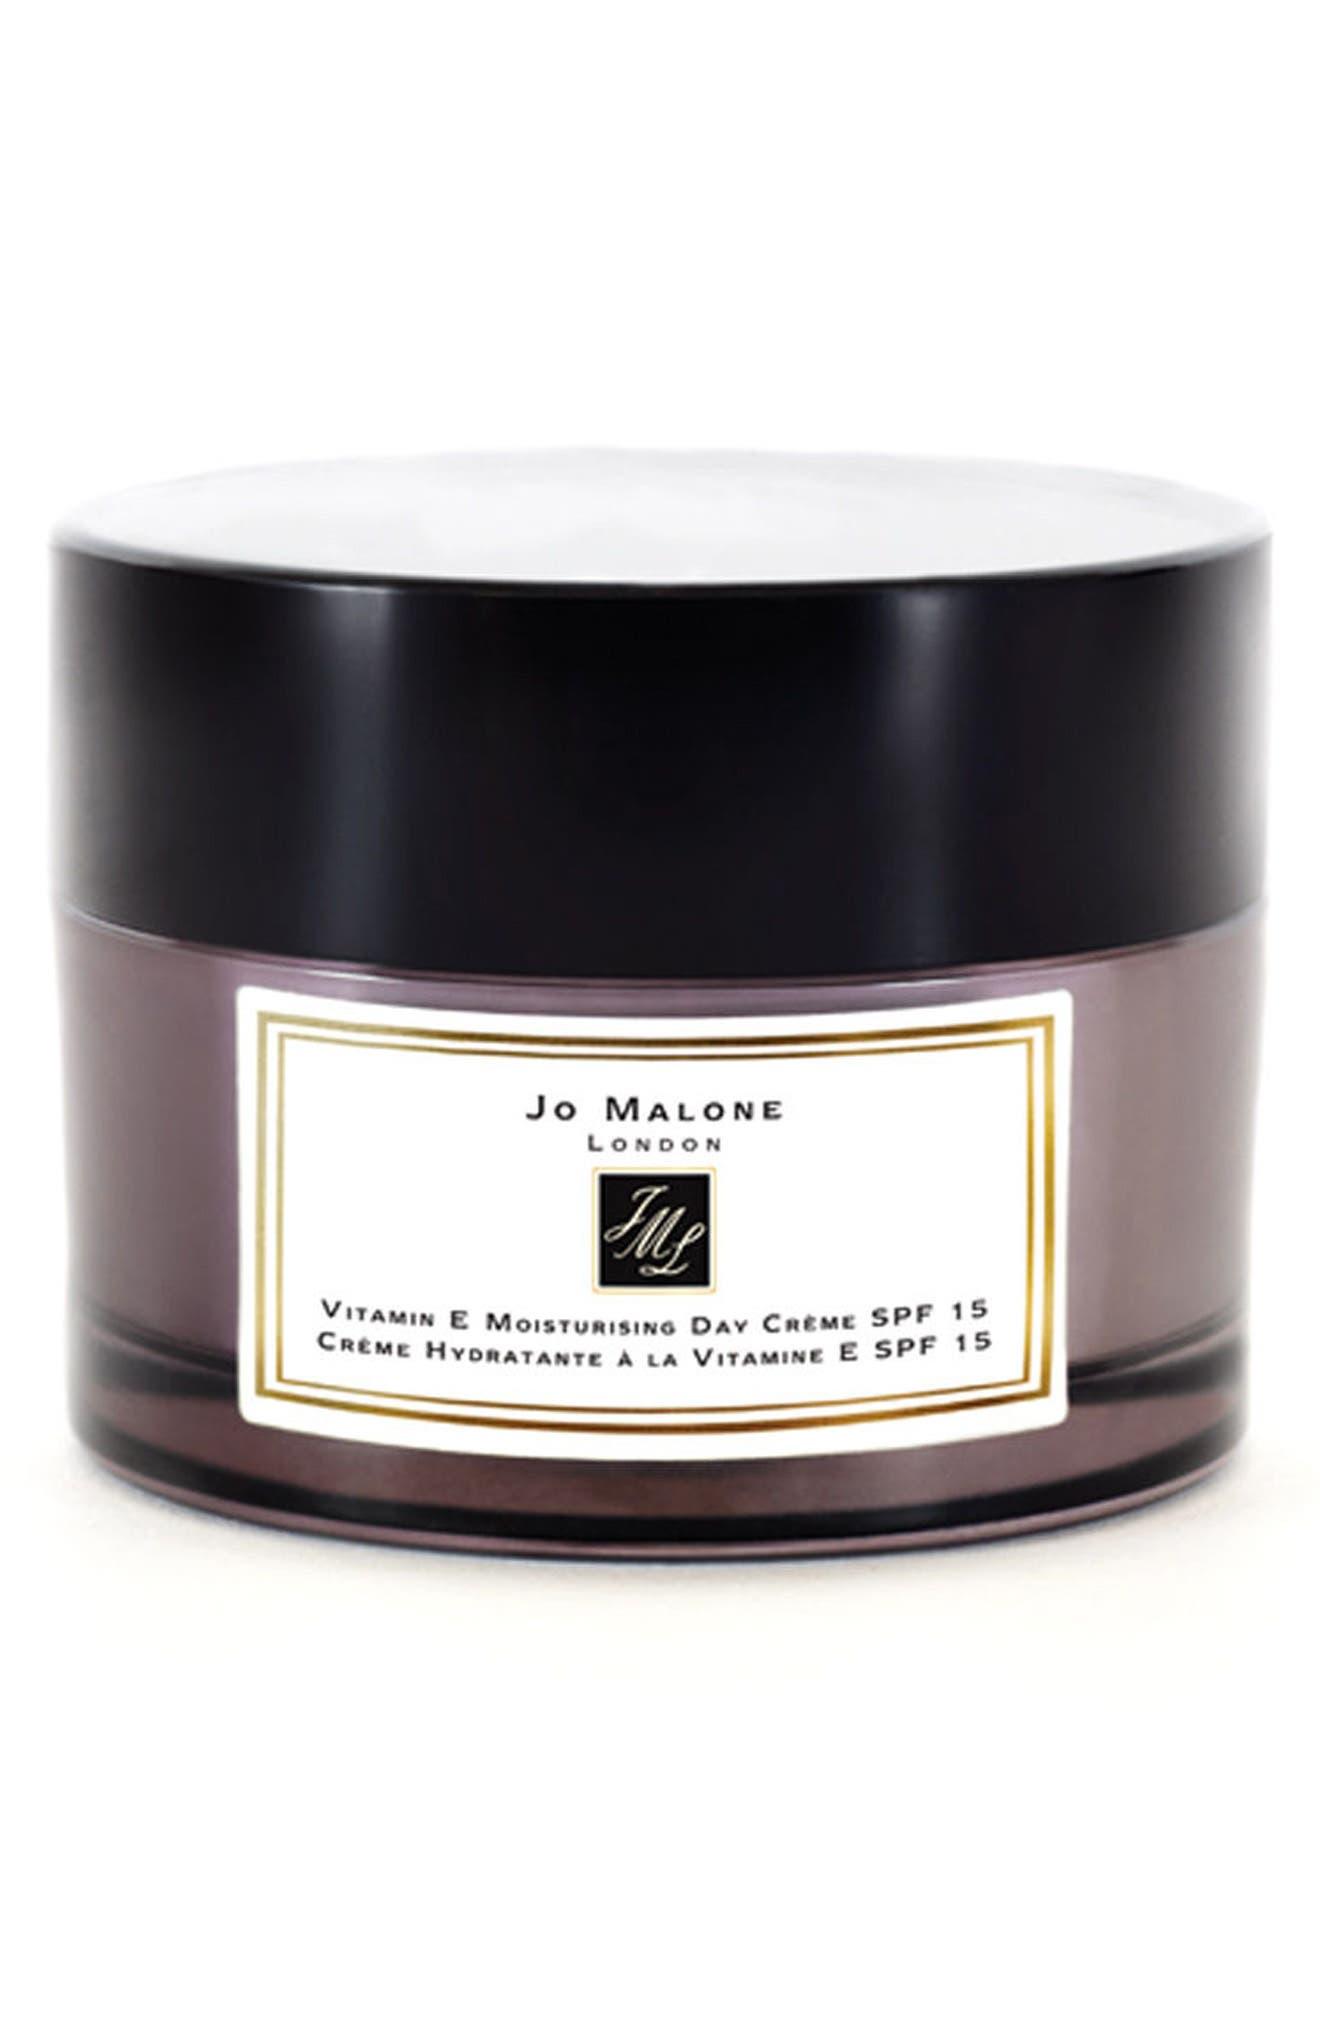 Alternate Image 1 Selected - Jo Malone London™ 'Vitamin E' Moisturizing Day Crème Broad Spectrum SPF 15